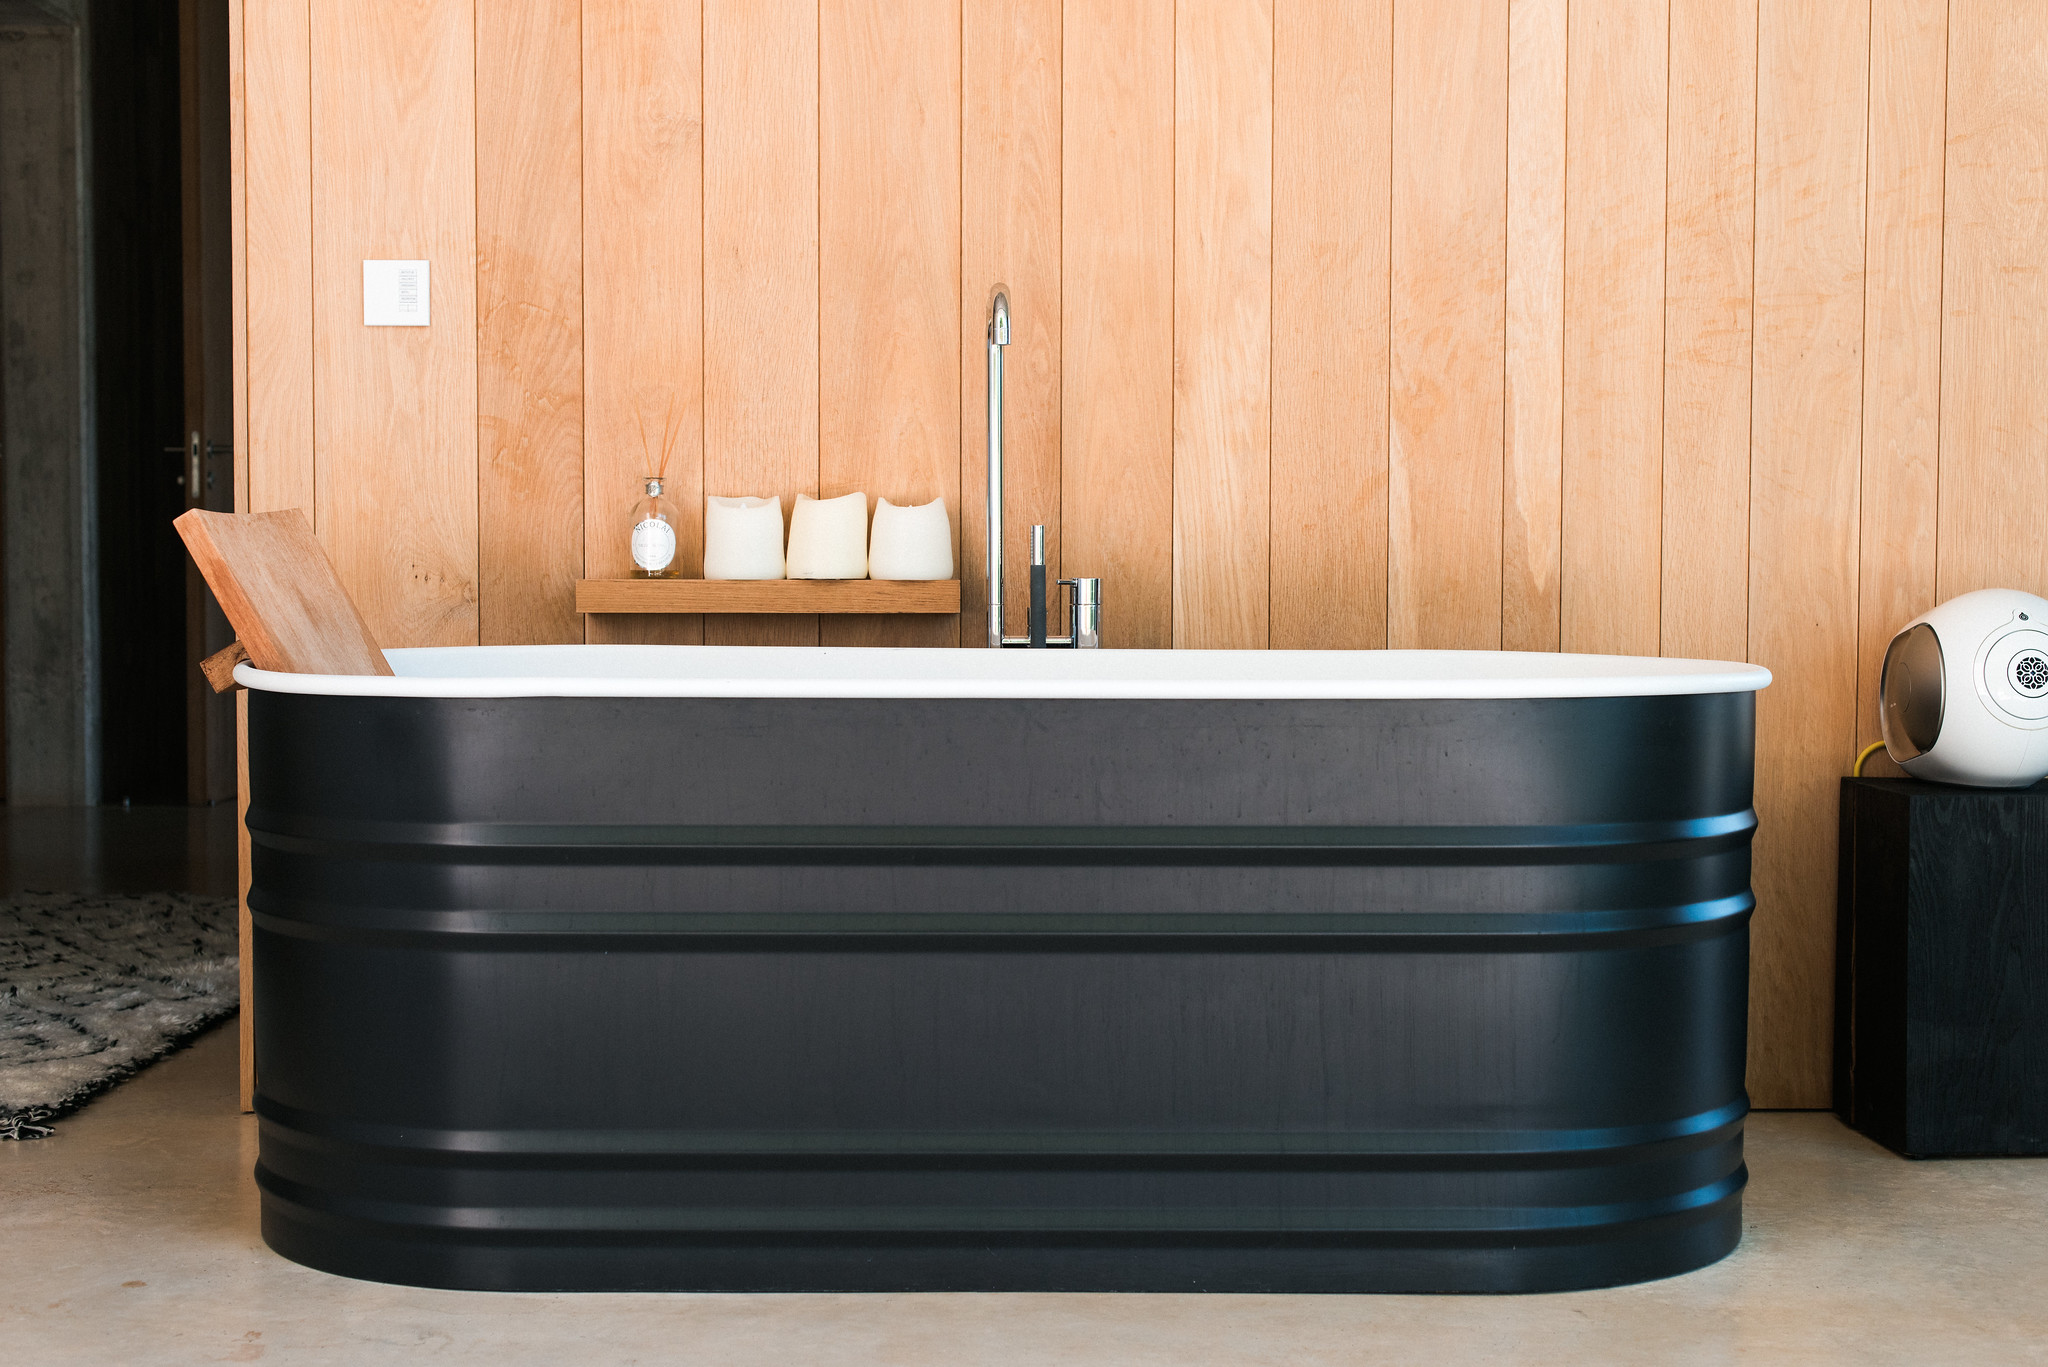 https://www.white-ibiza.com/wp-content/uploads/2020/06/white-ibiza-villas-casa-valentina-interior-bath.jpg